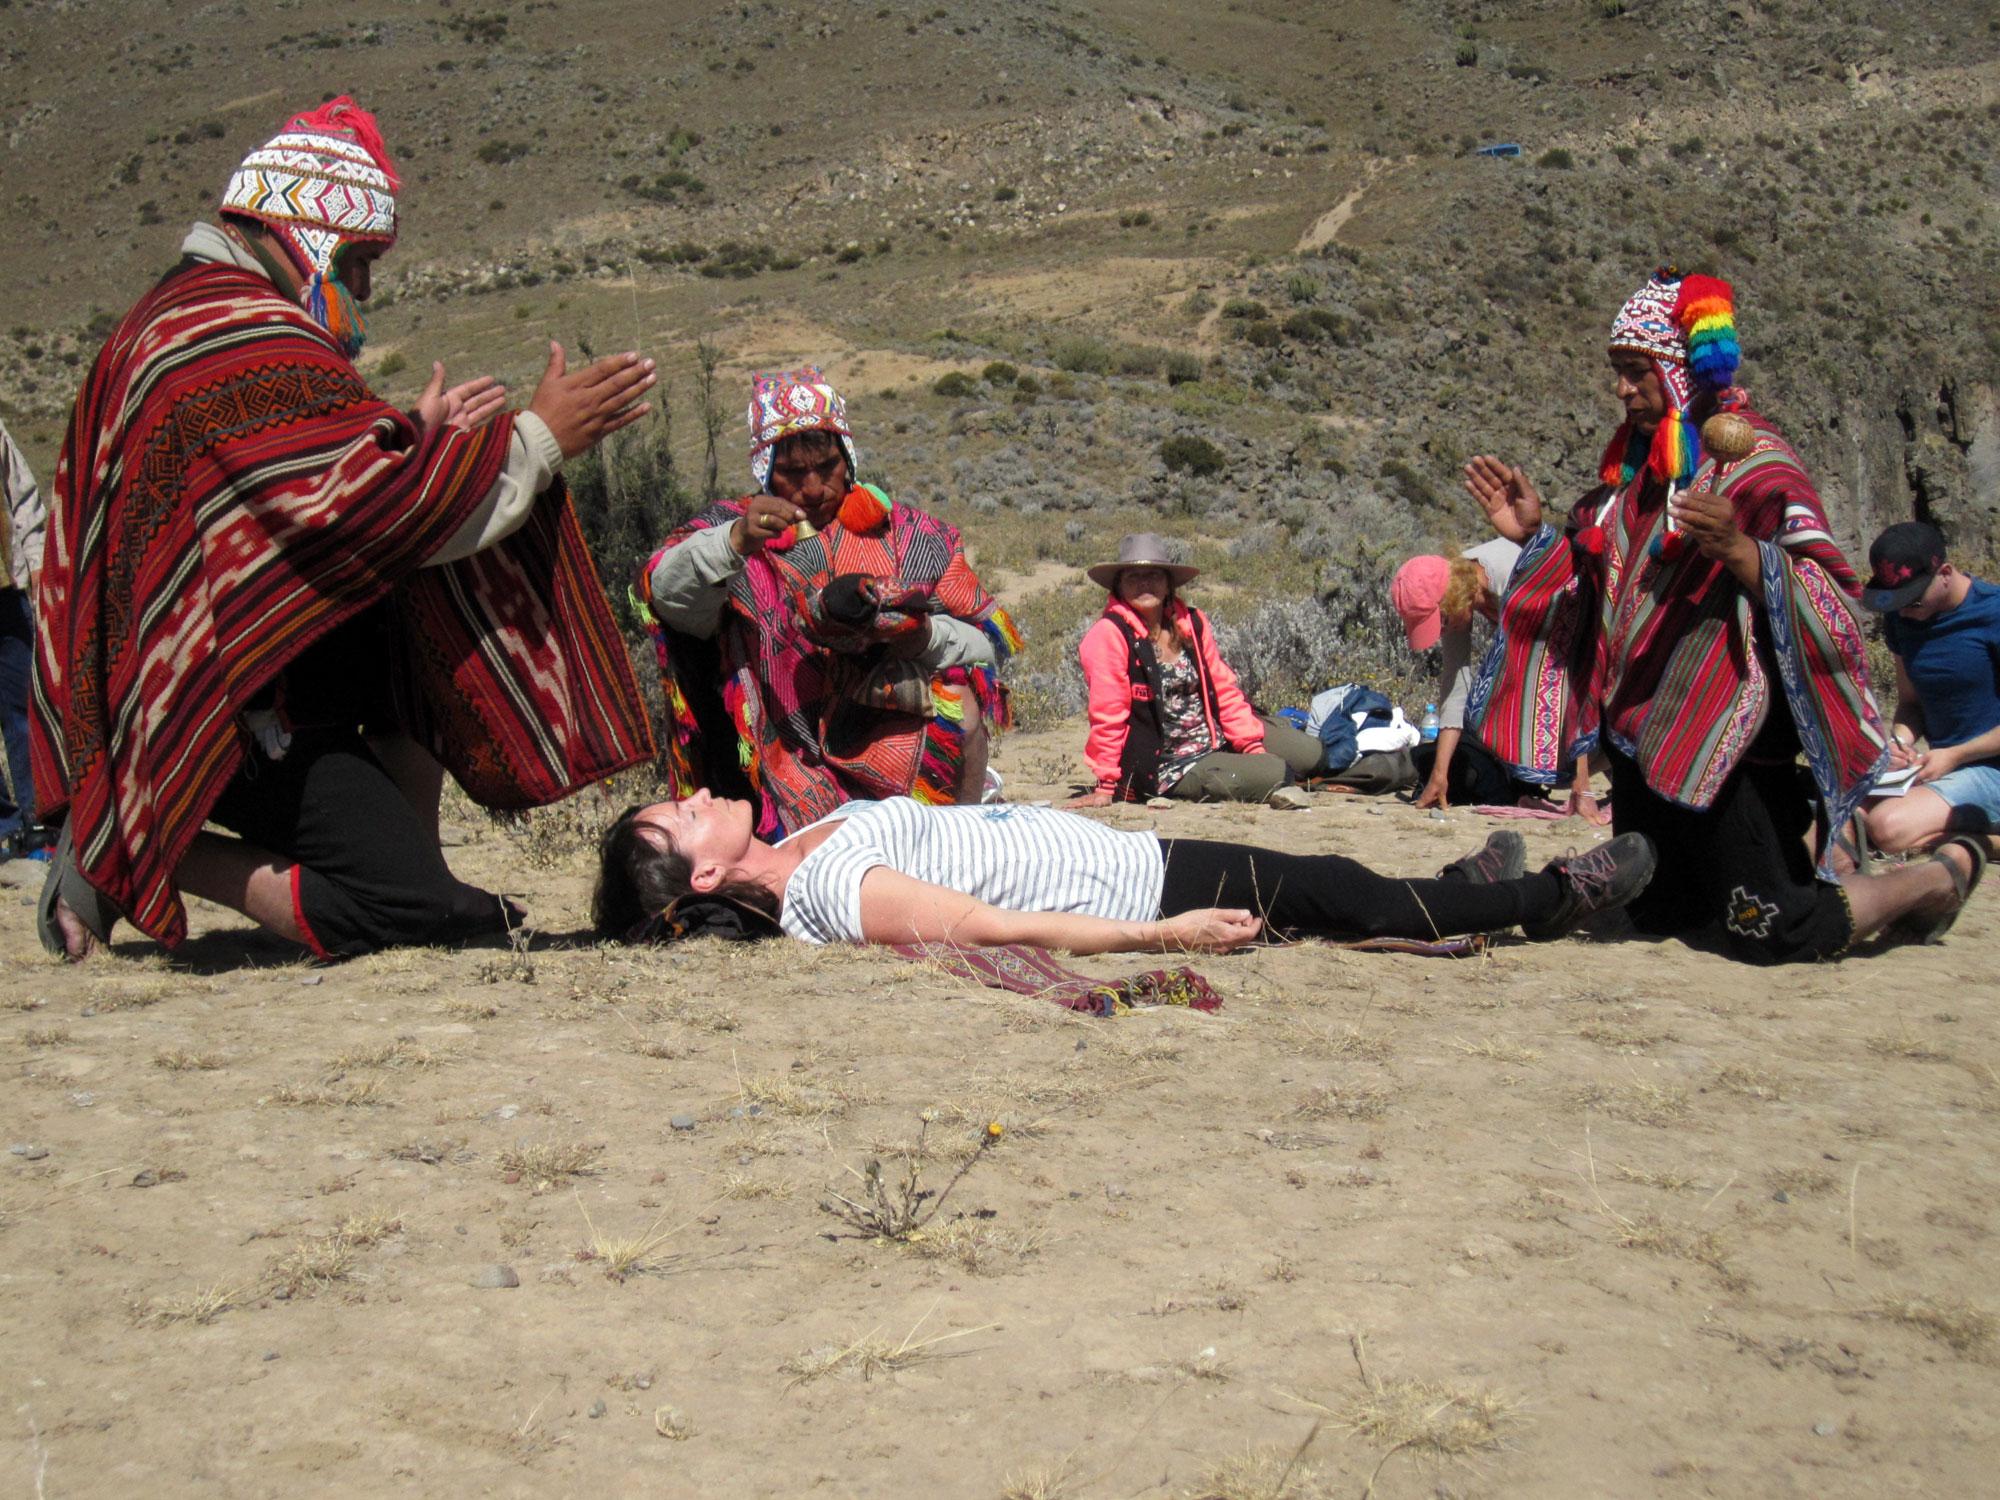 Ceremoni vid Colca Canyon